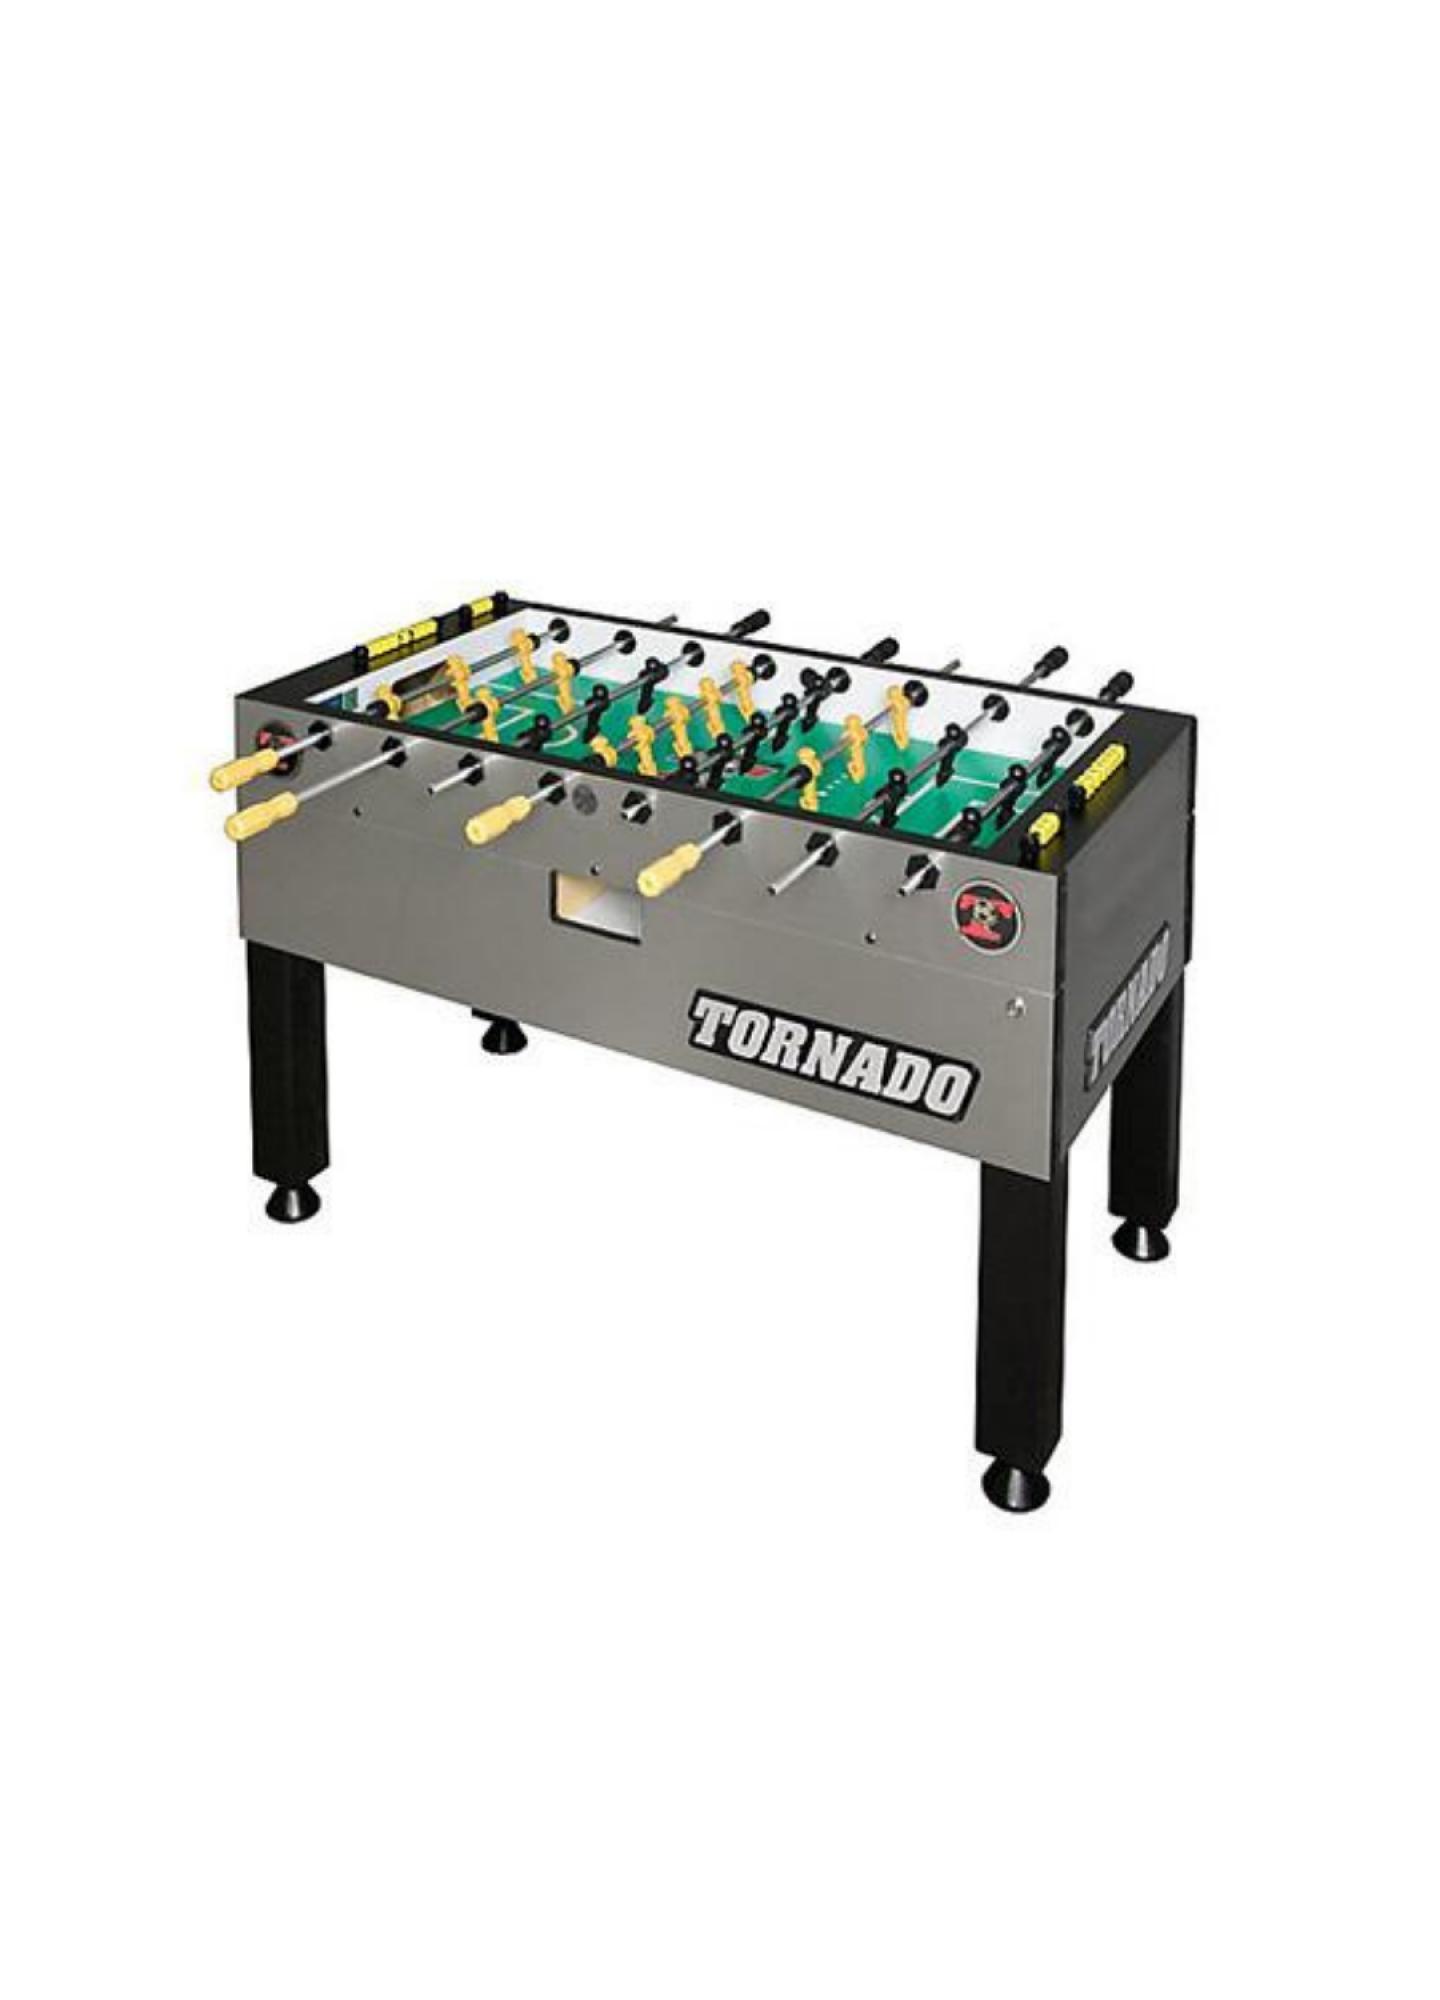 USA TORNADO T-3000 SOCCER TABLE